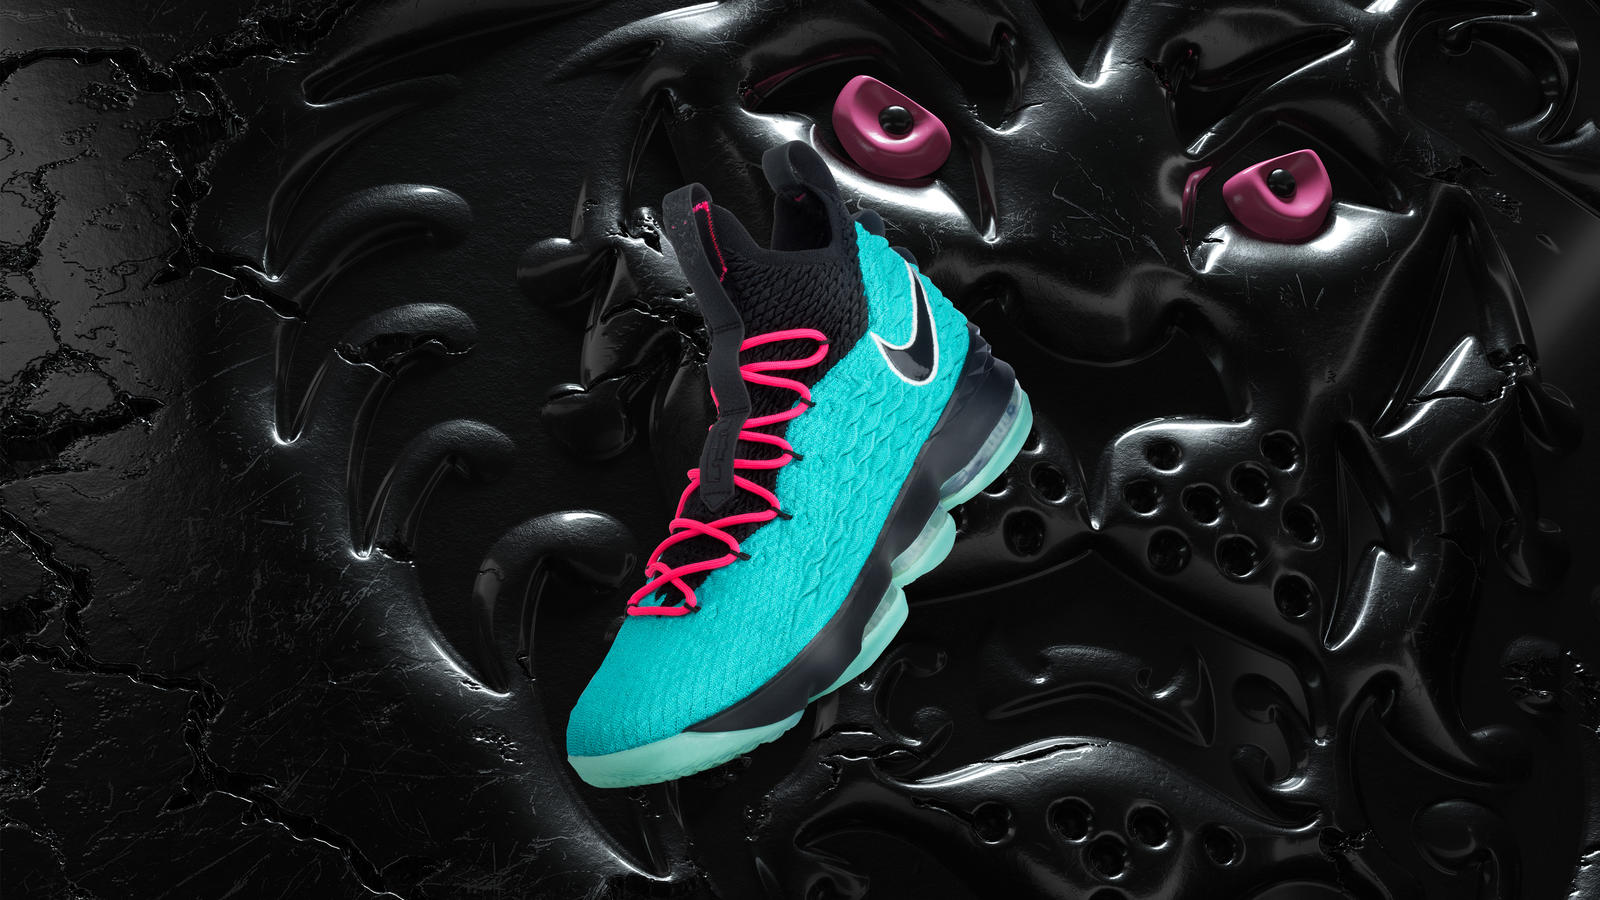 Nike Air Max 95, Pink LeBron Shoes, LeBron James Shoes